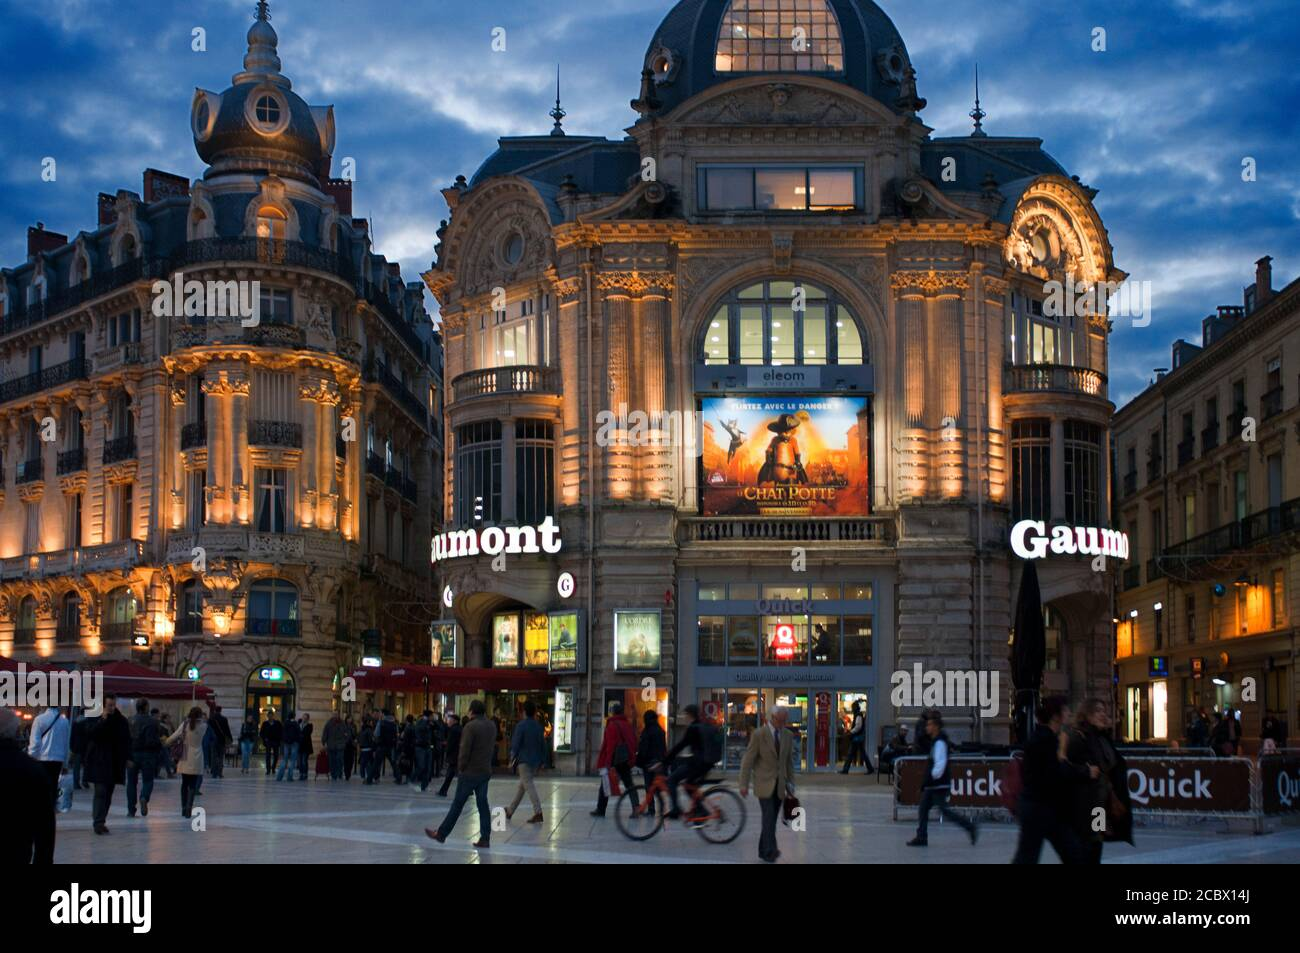 Gaumont Cinema Place de la Comedie Montpellier Languedoc Roussillon Frankreich. Bars und Restaurants an der Plaza de la Comedia. Sie bildet den Nerv Stockfoto